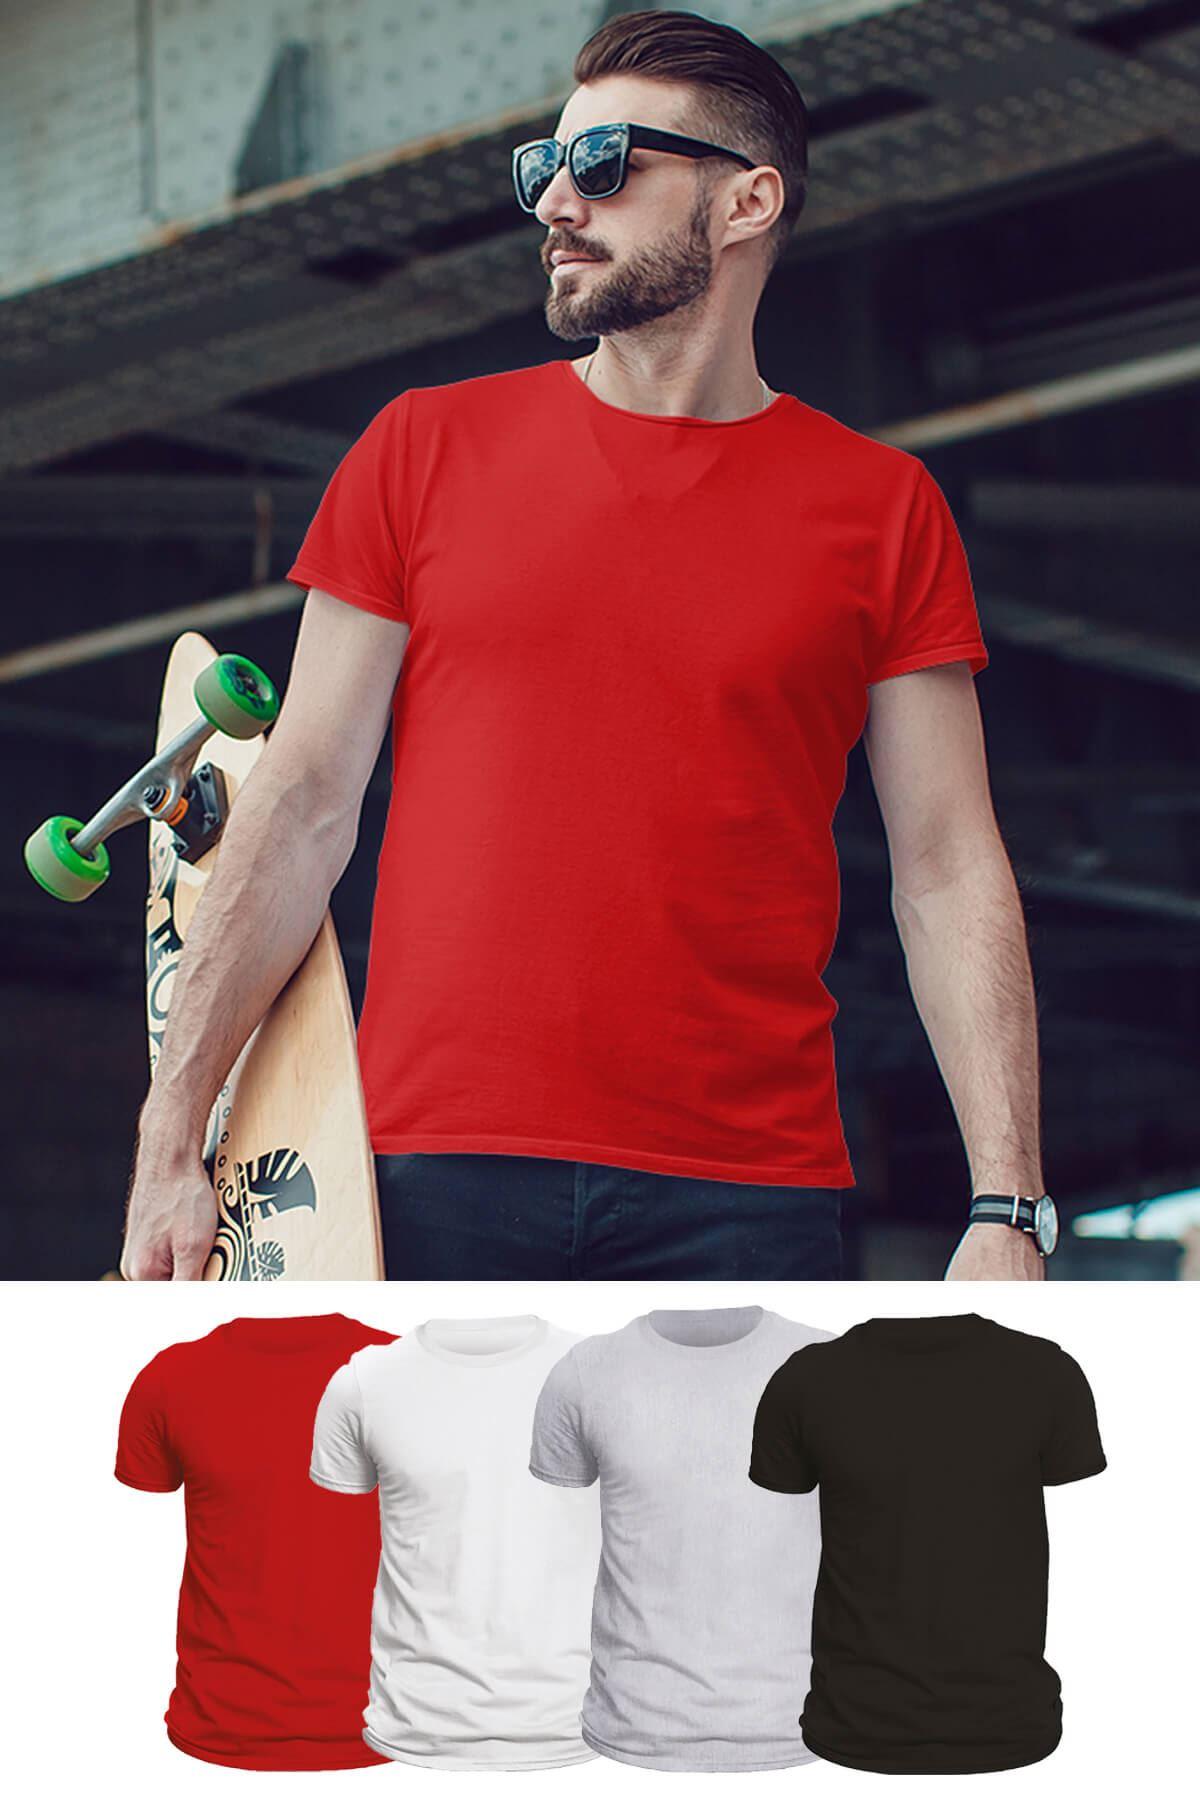 Tonny Mood  Kırmızı - Siyah - Beyaz- Gri Melanj 4'lü Set Basic Erkek Tshirt - Tişört